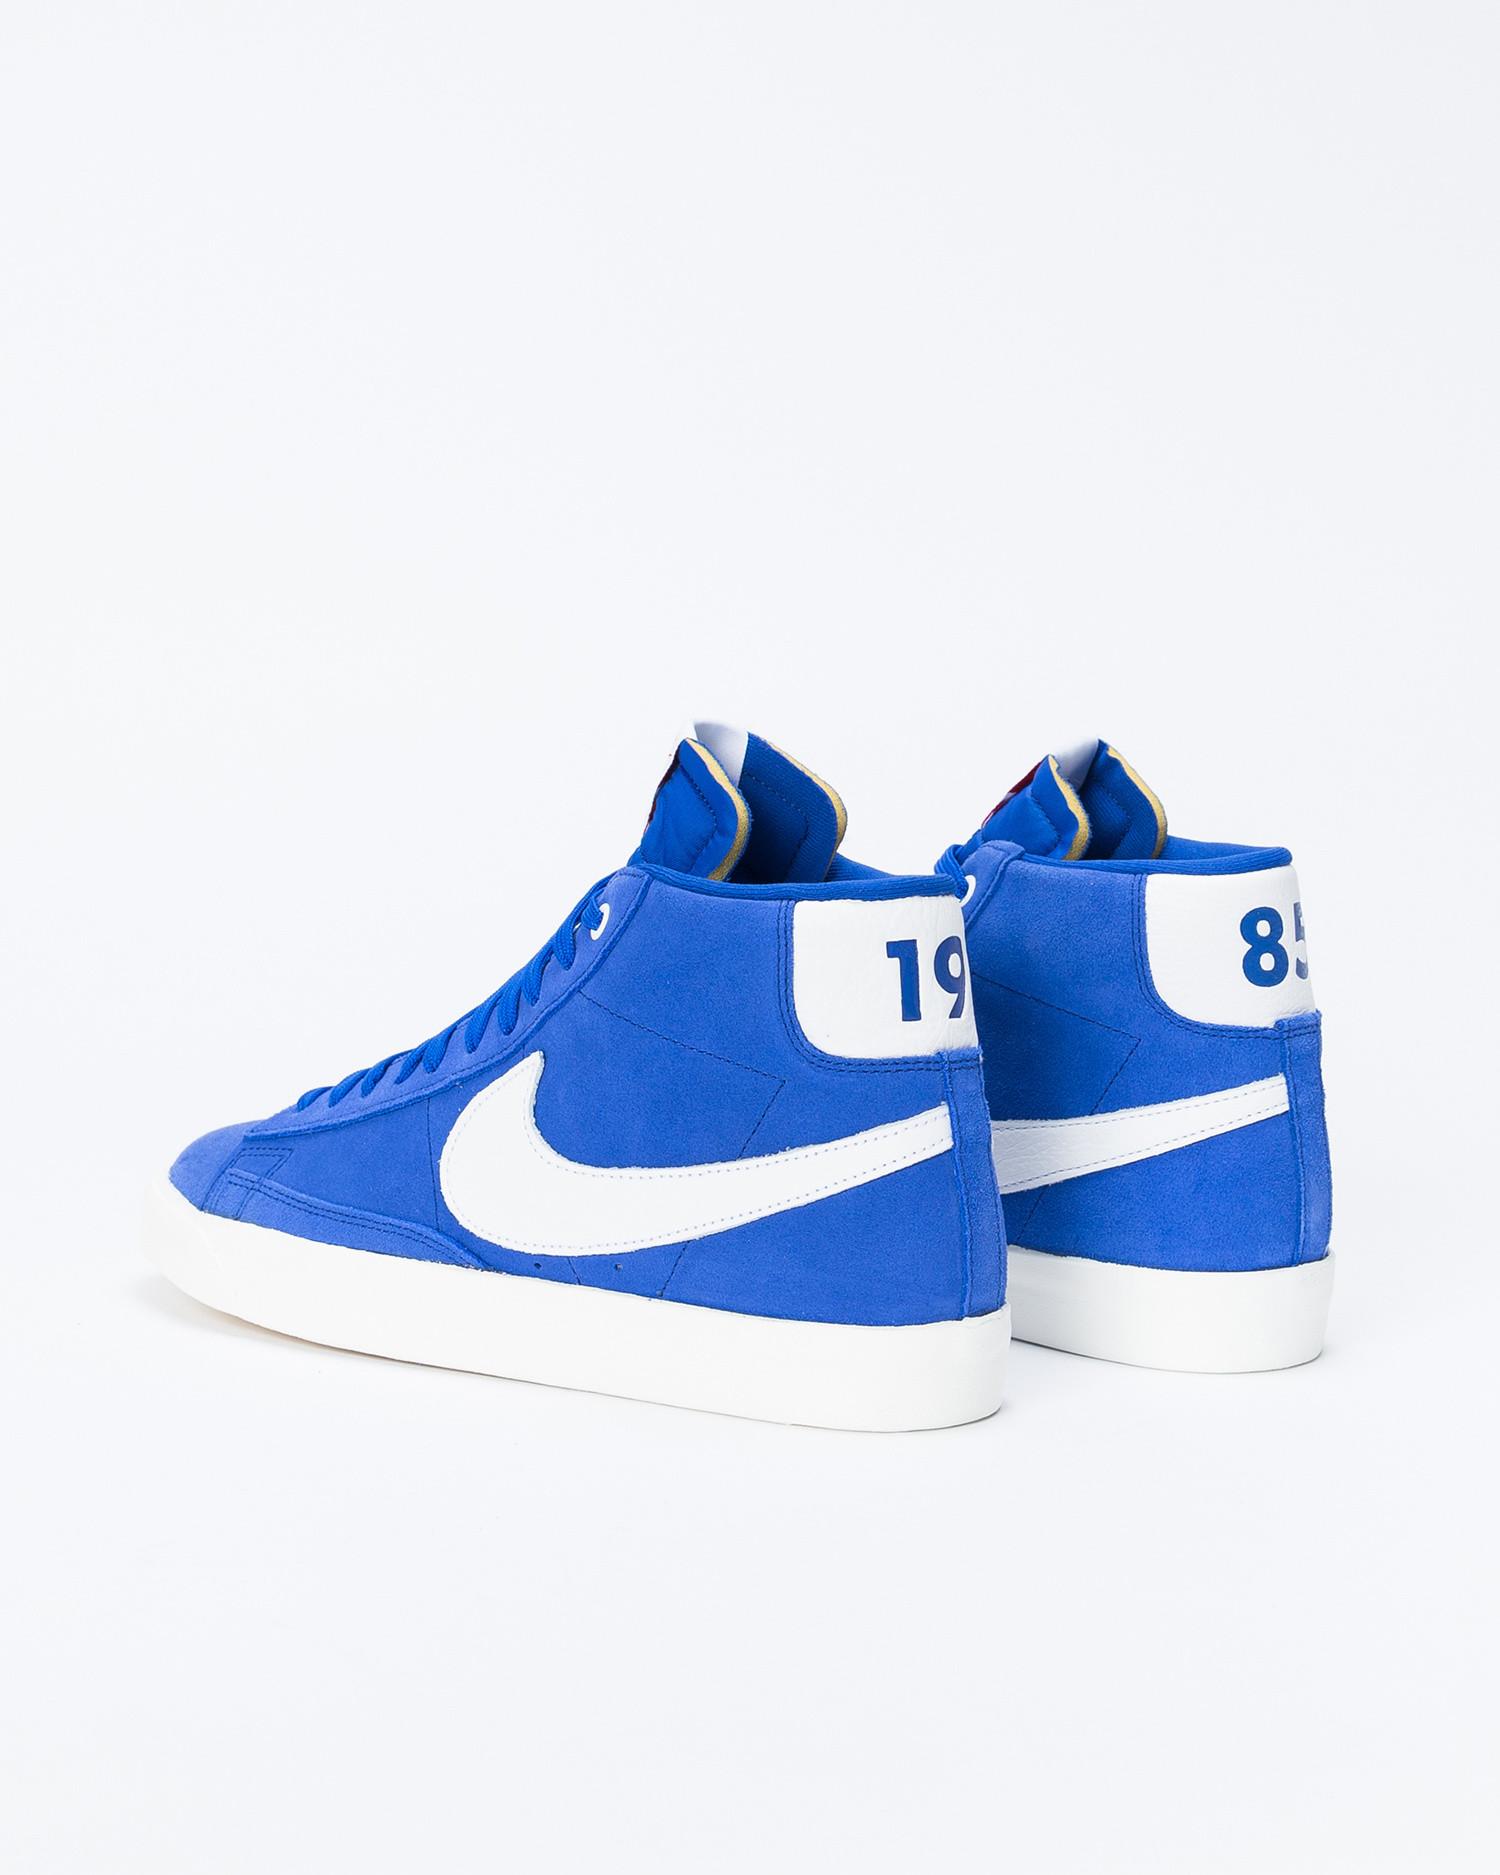 Nike Blazer Mid QS x Stranger Things Game royal/white-sail-university red